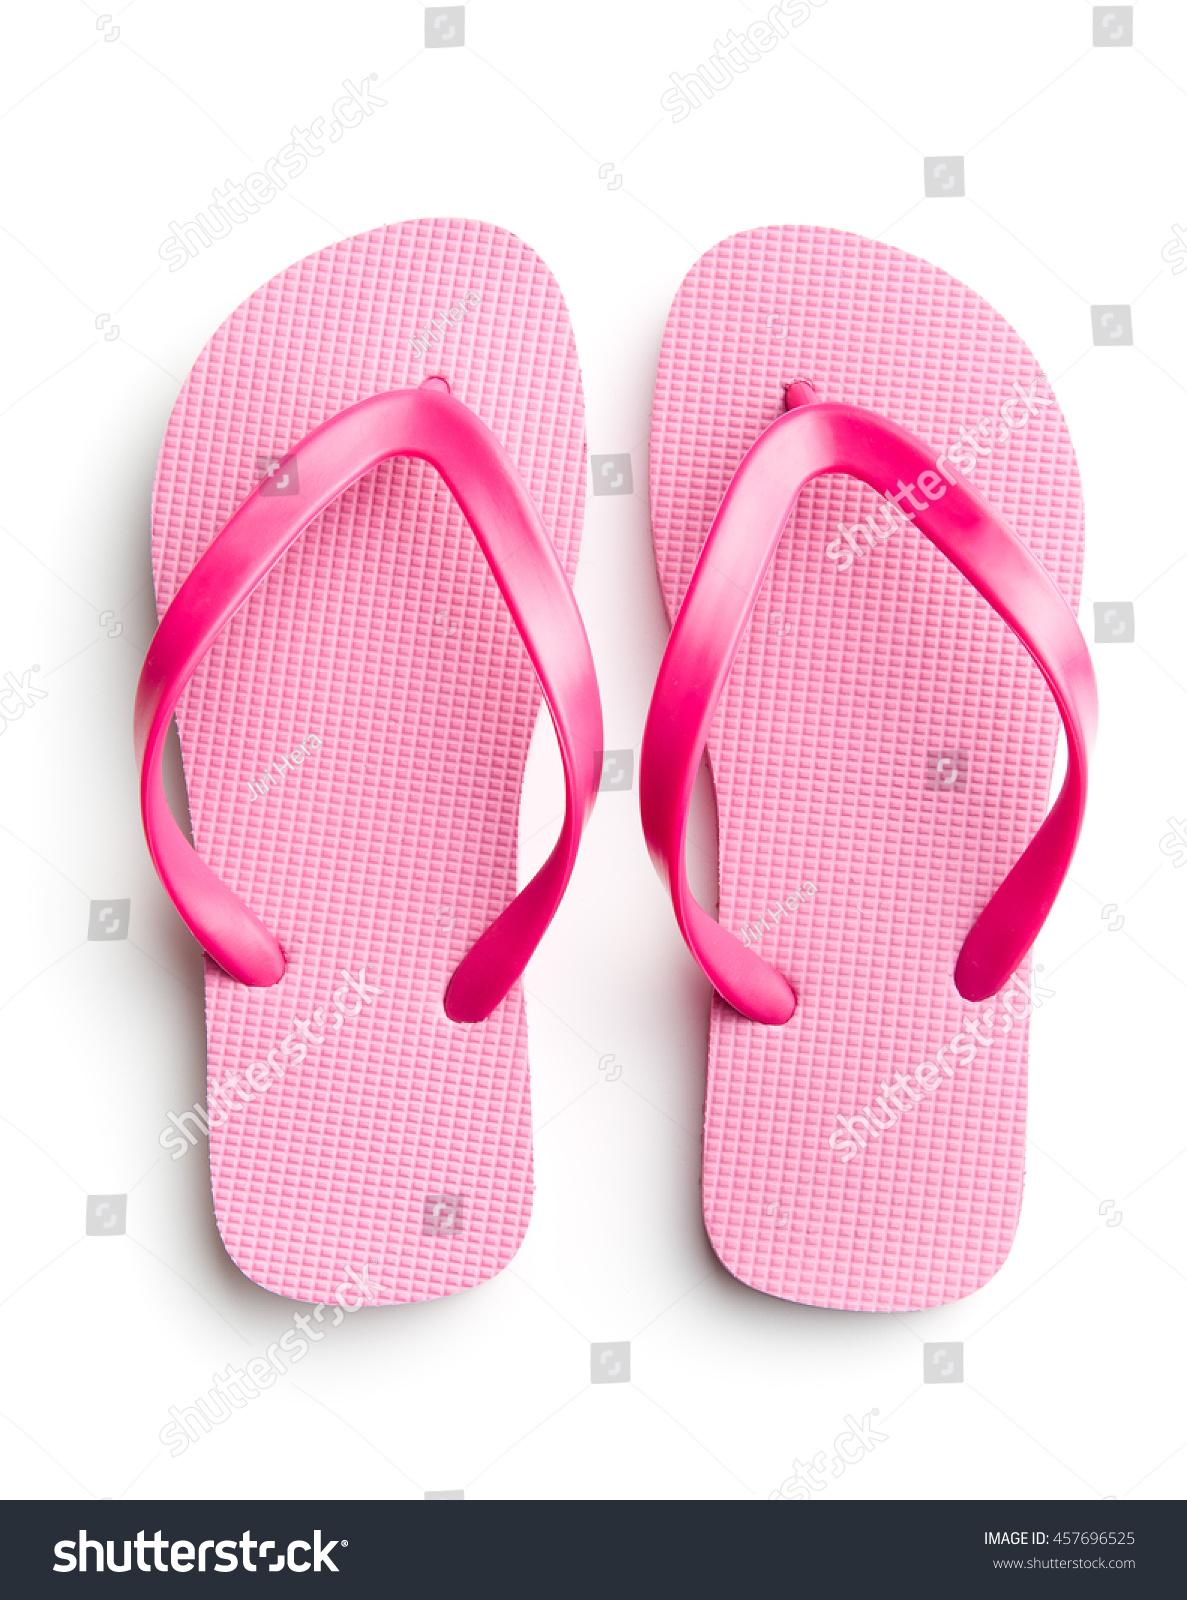 Pink Flip Flops Isolated On White Foto de stock (libre de regalías ...